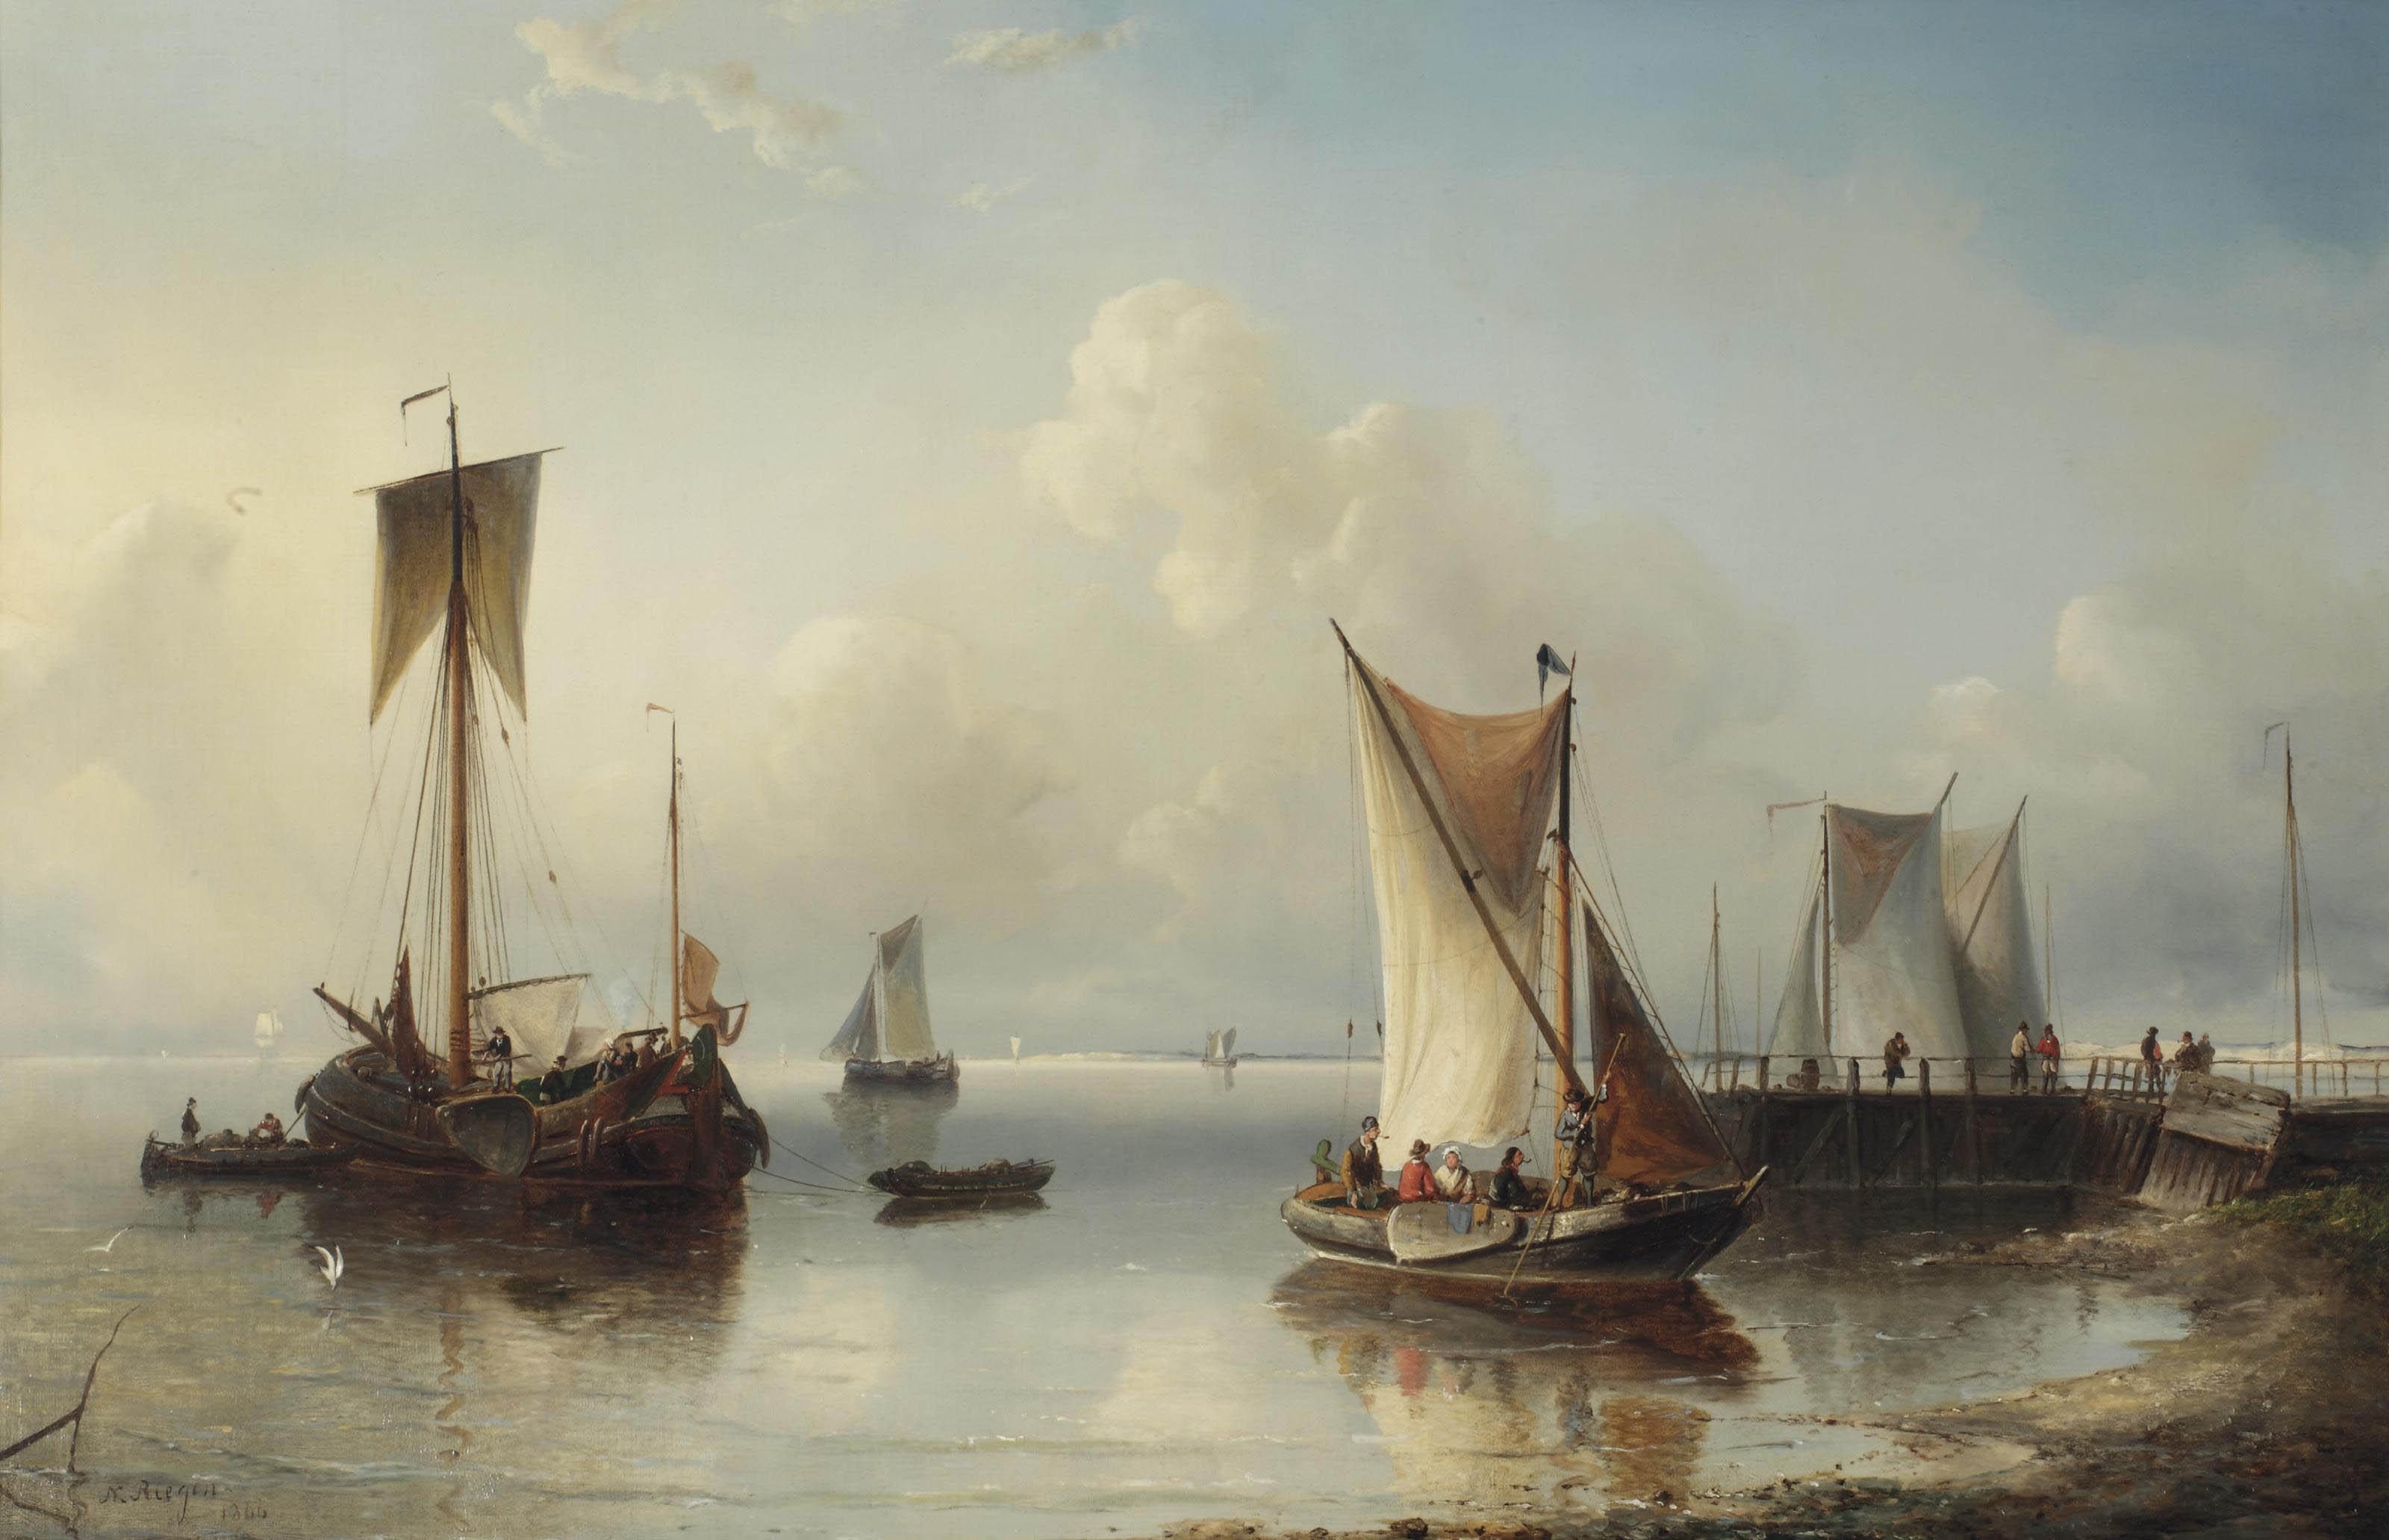 Shipping near the shore